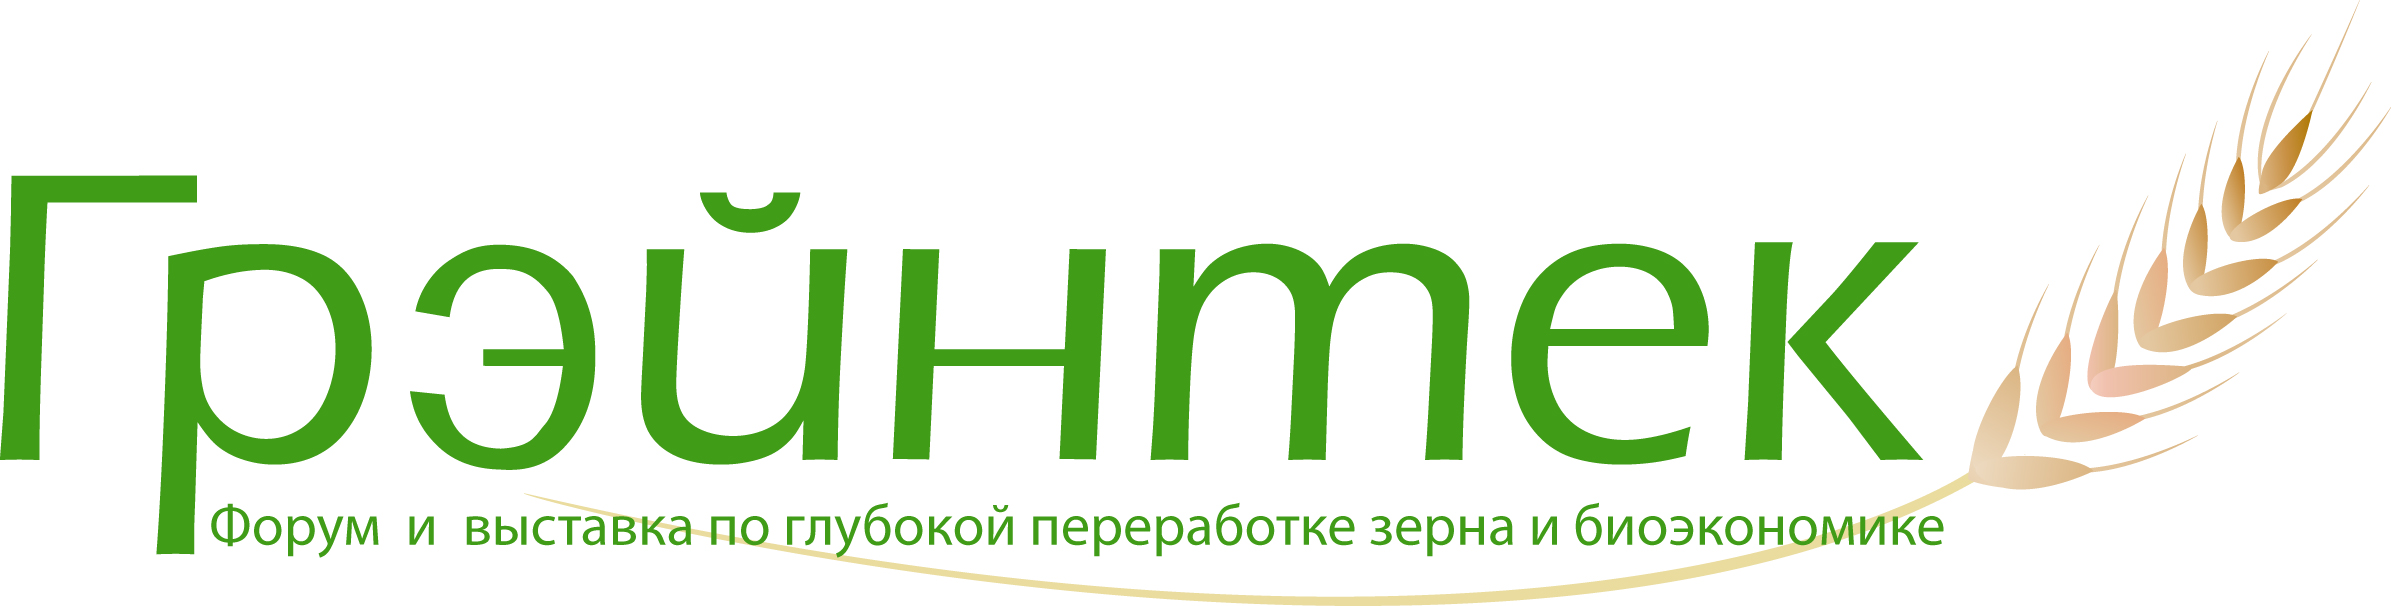 2016_graintek_logo_ru